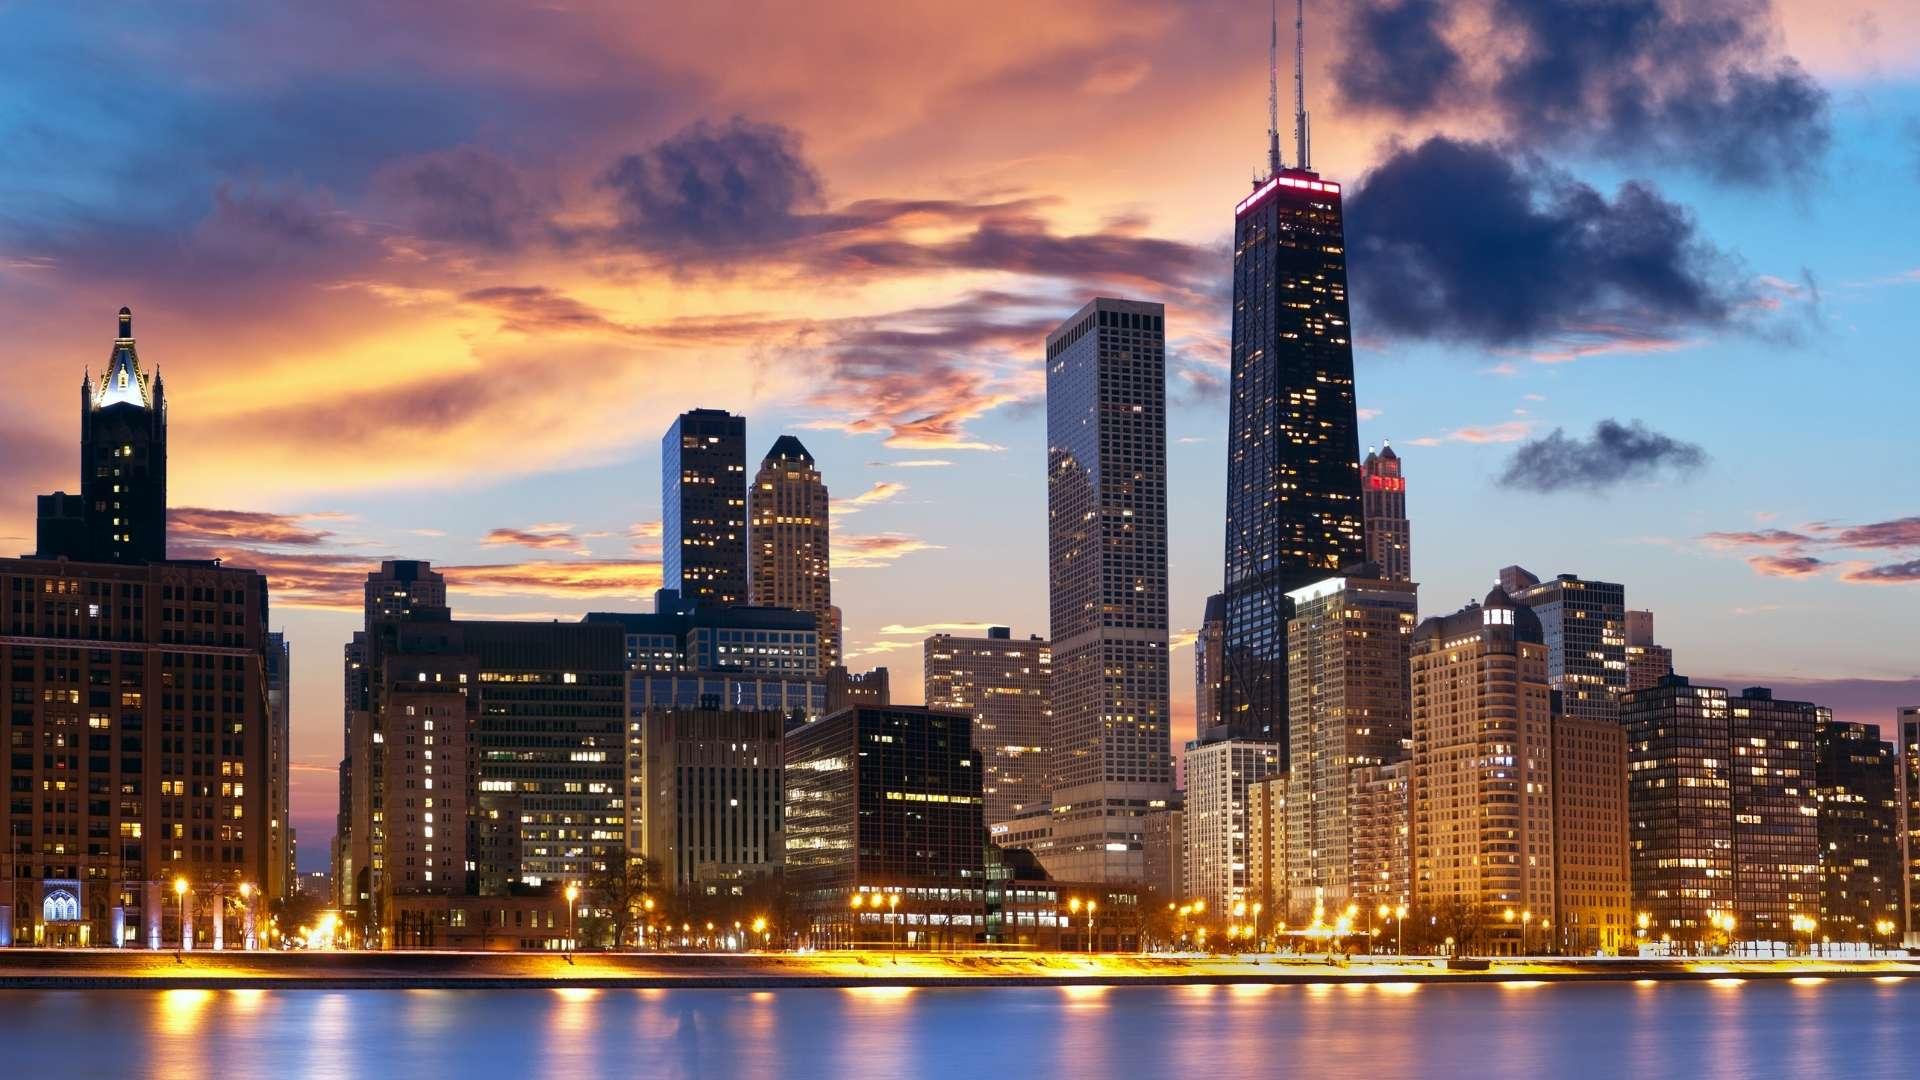 Chicago_Skyline_1920x1080.jpg